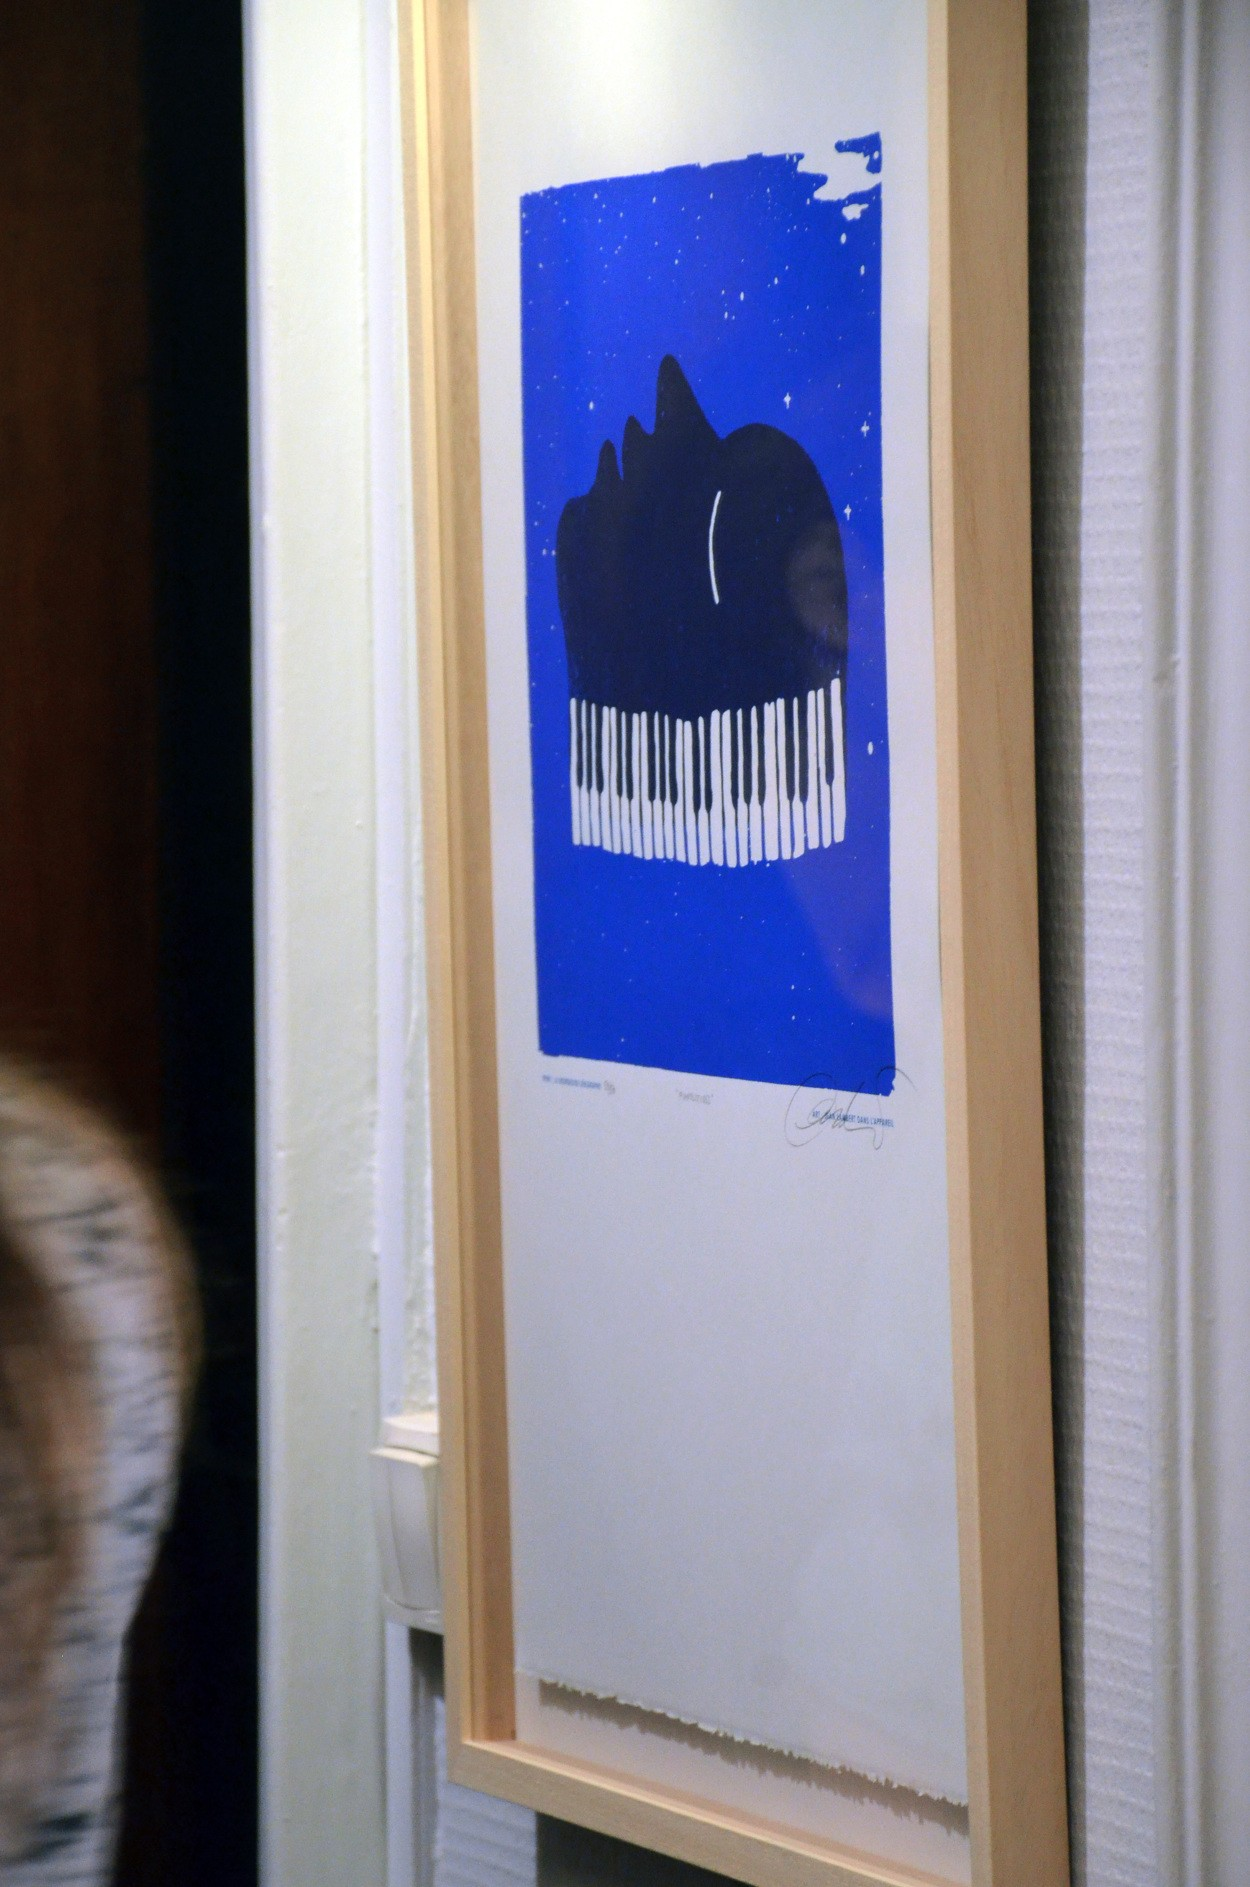 Pianolitudes (Sérigraphie)